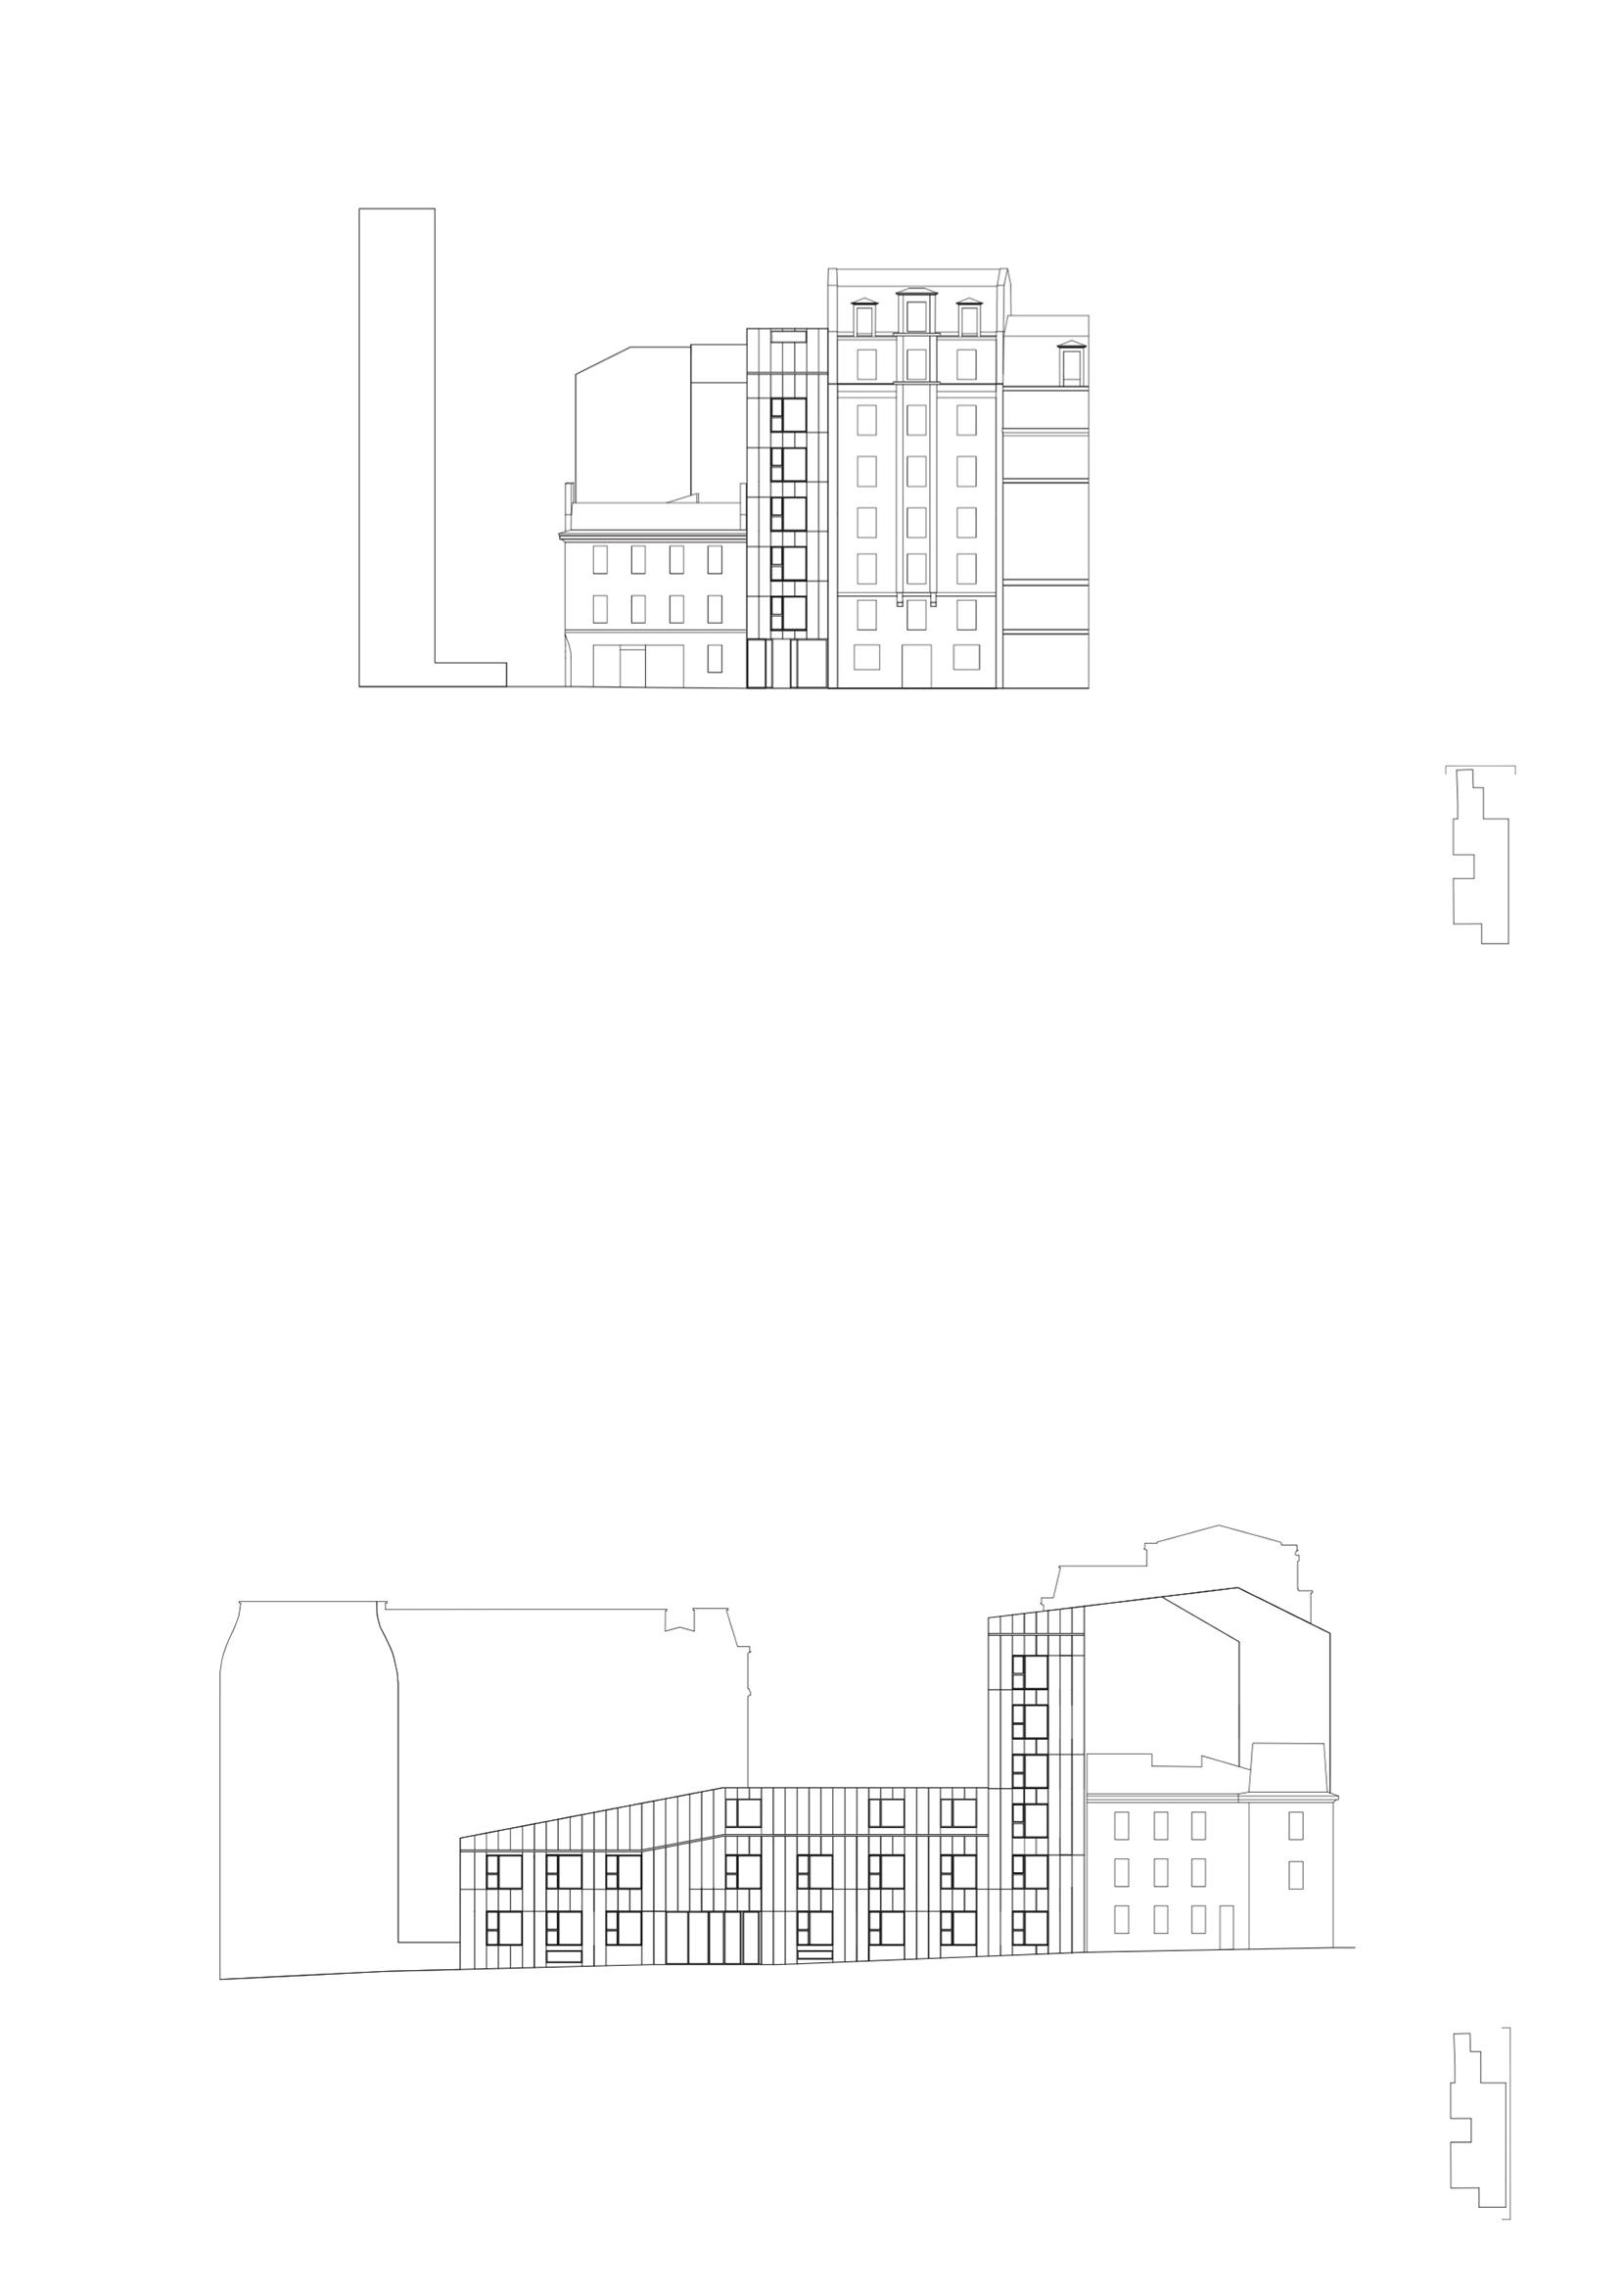 Planchette Sheltered Housing Arcdog Ttc M Block Diagram Related